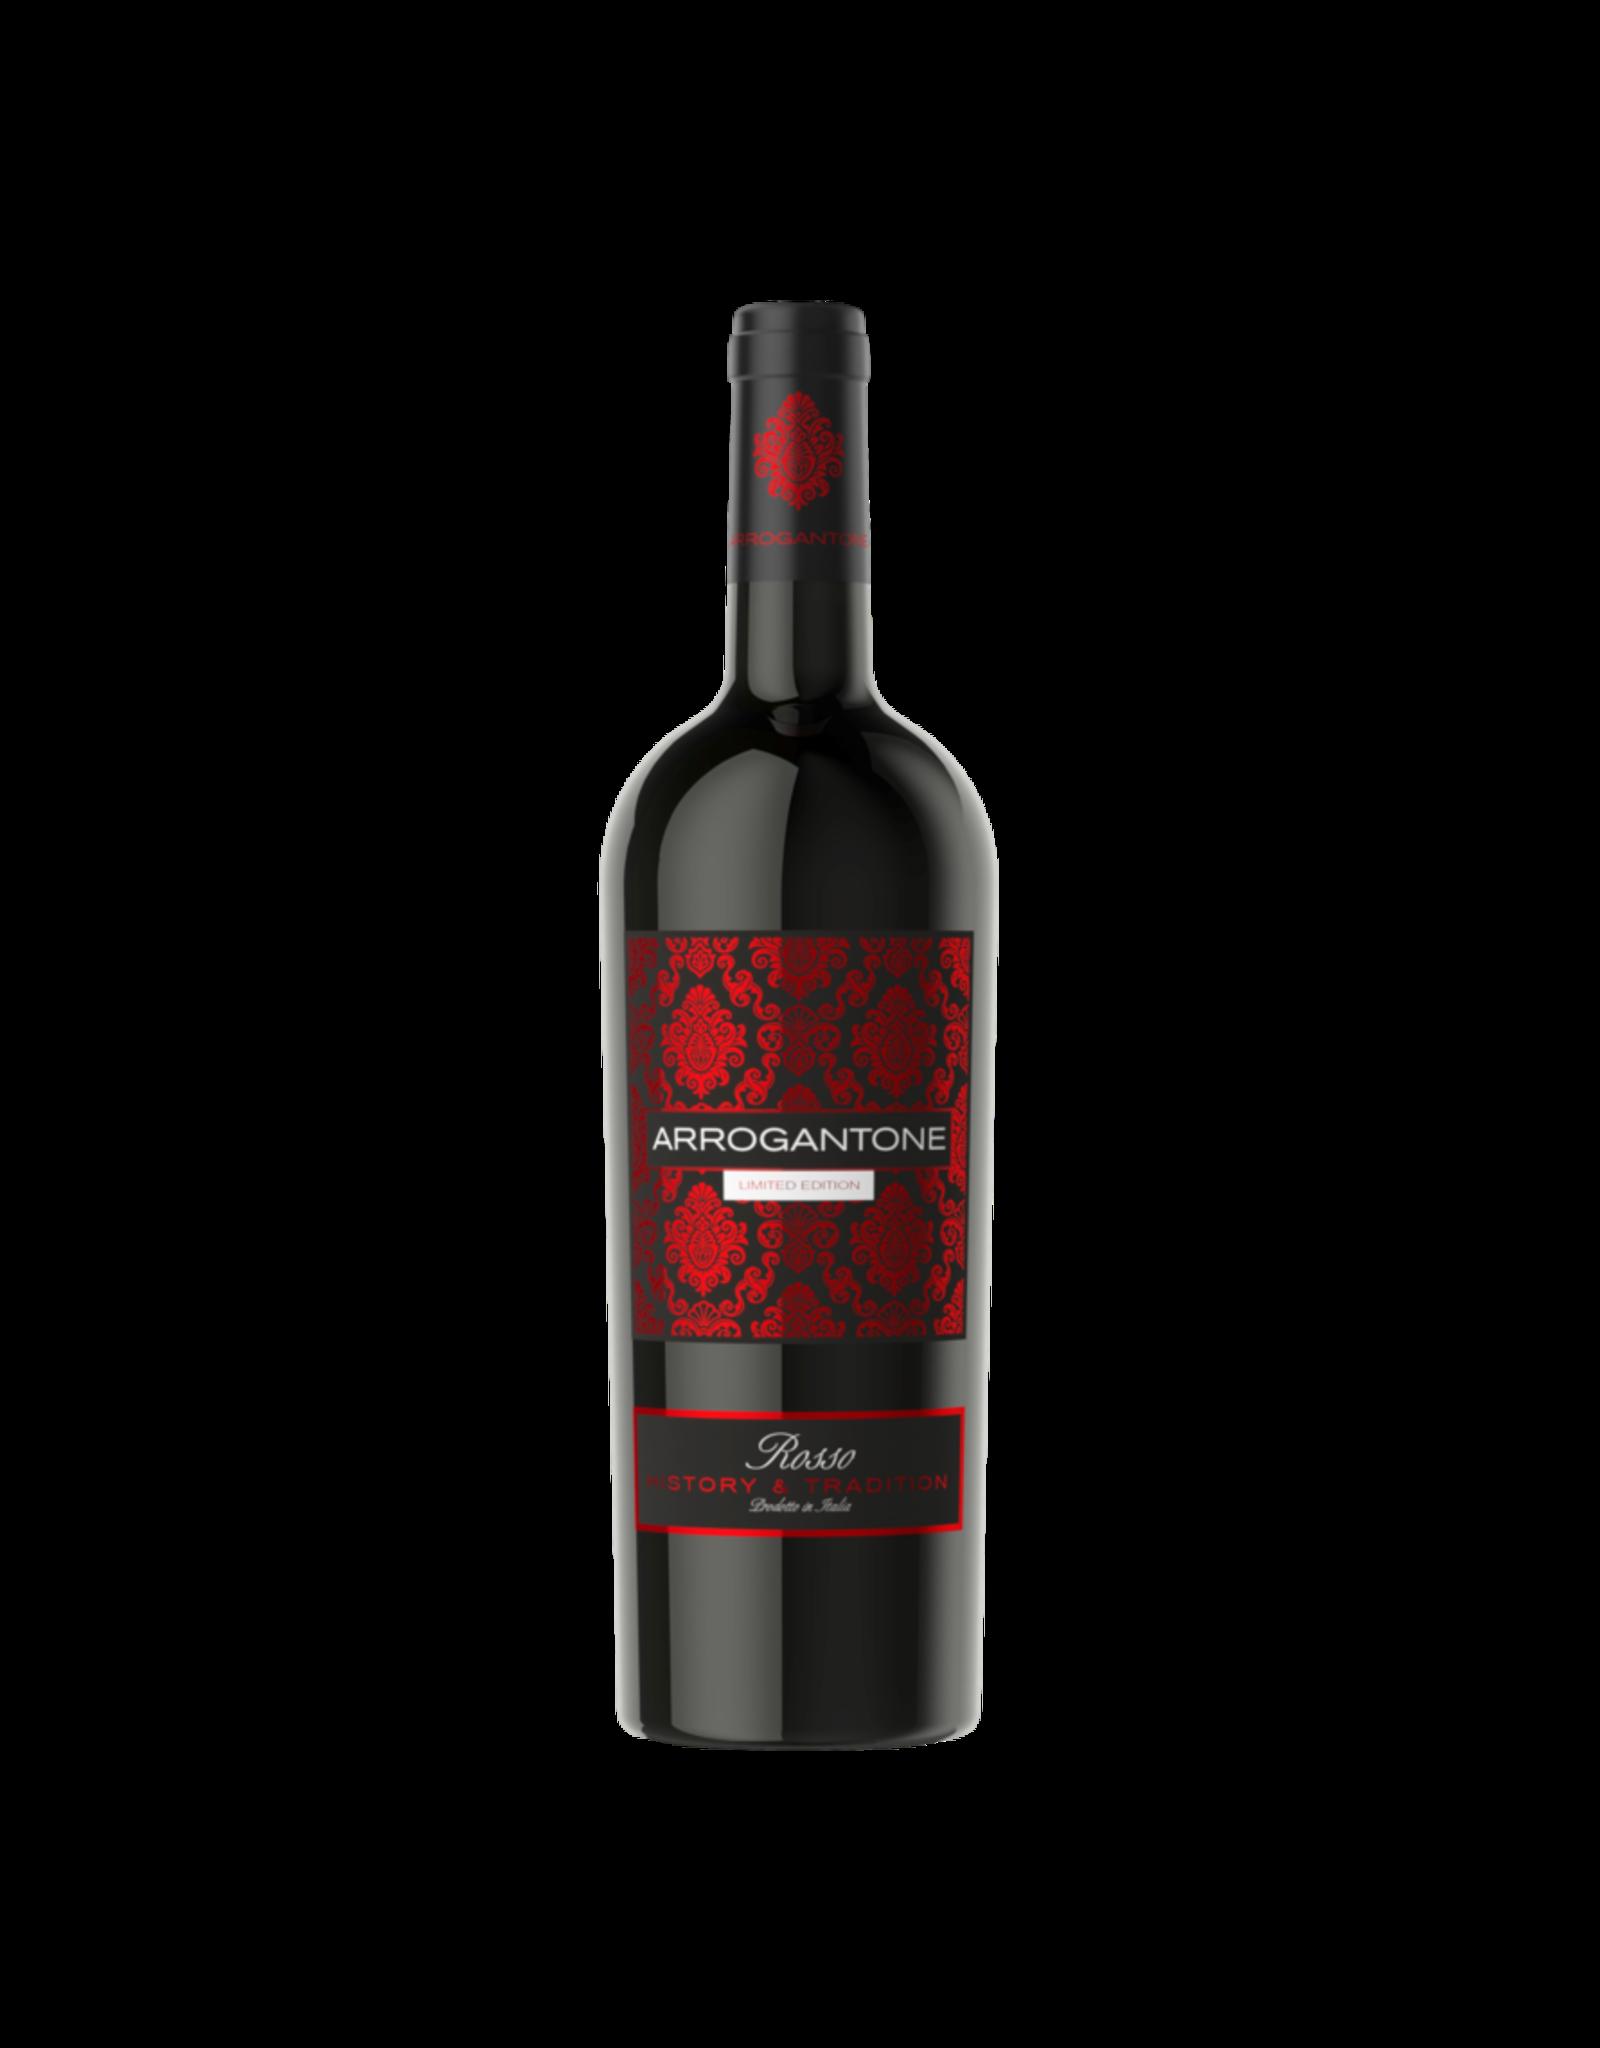 Famiglia Falorni (Agricole Selvi) Arrogantone Rosso d'Italia Limited Edition